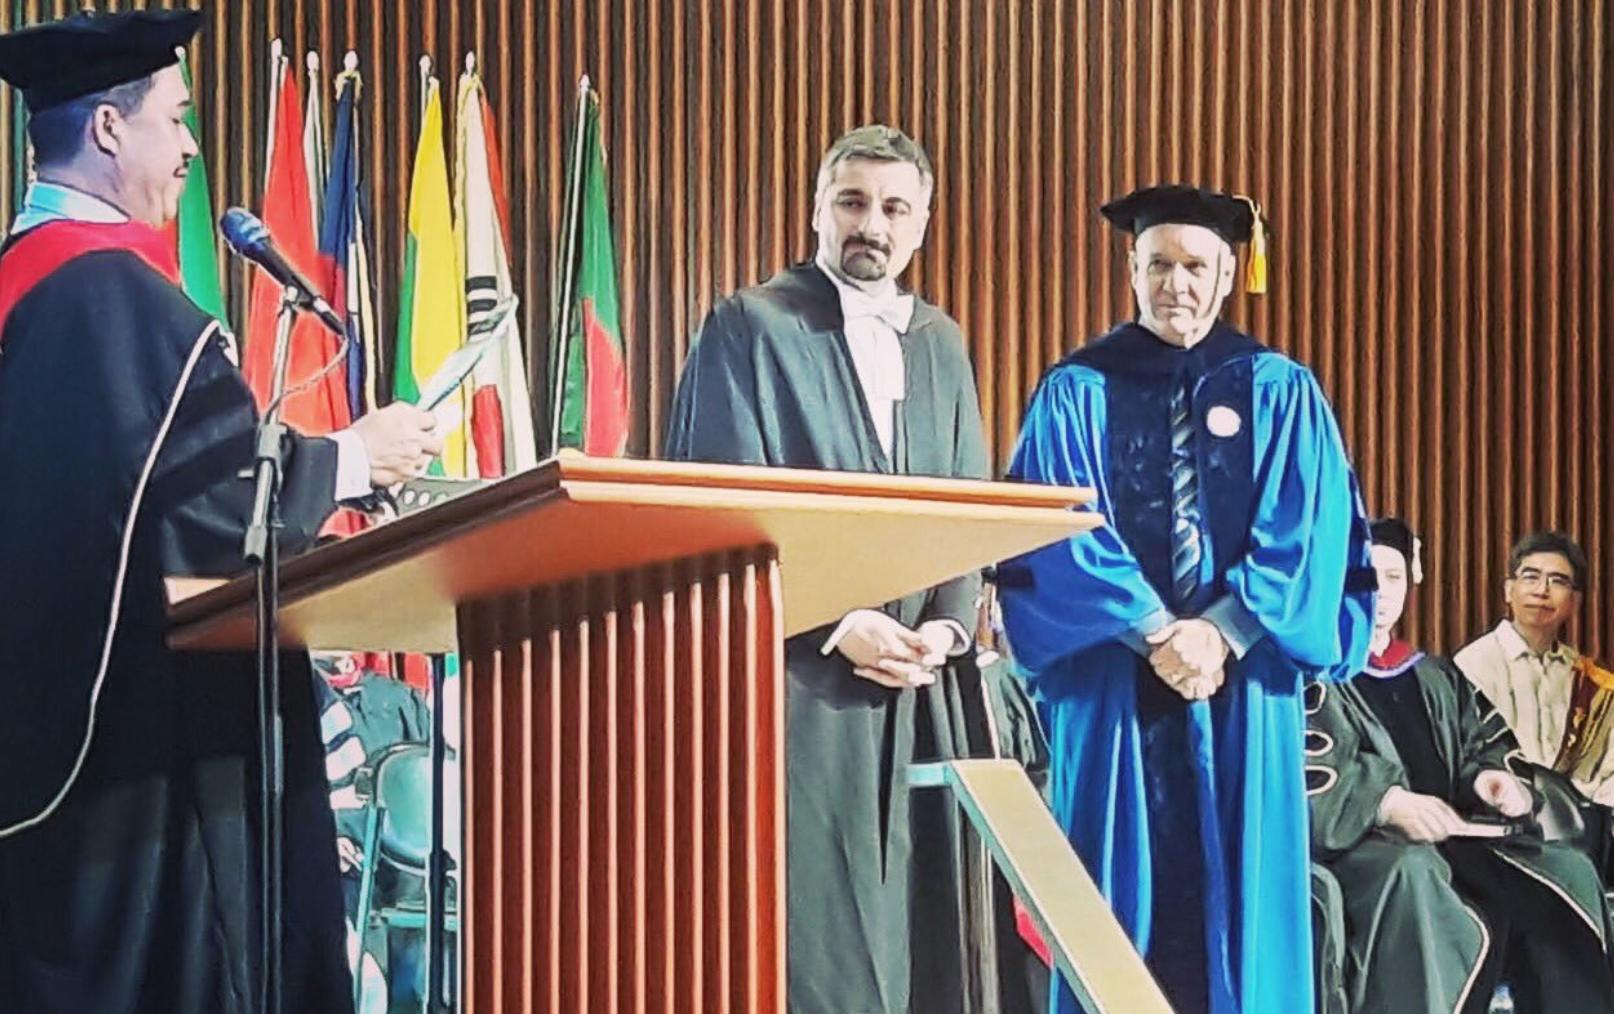 Giving the graduation talk at a graduate school in Manila